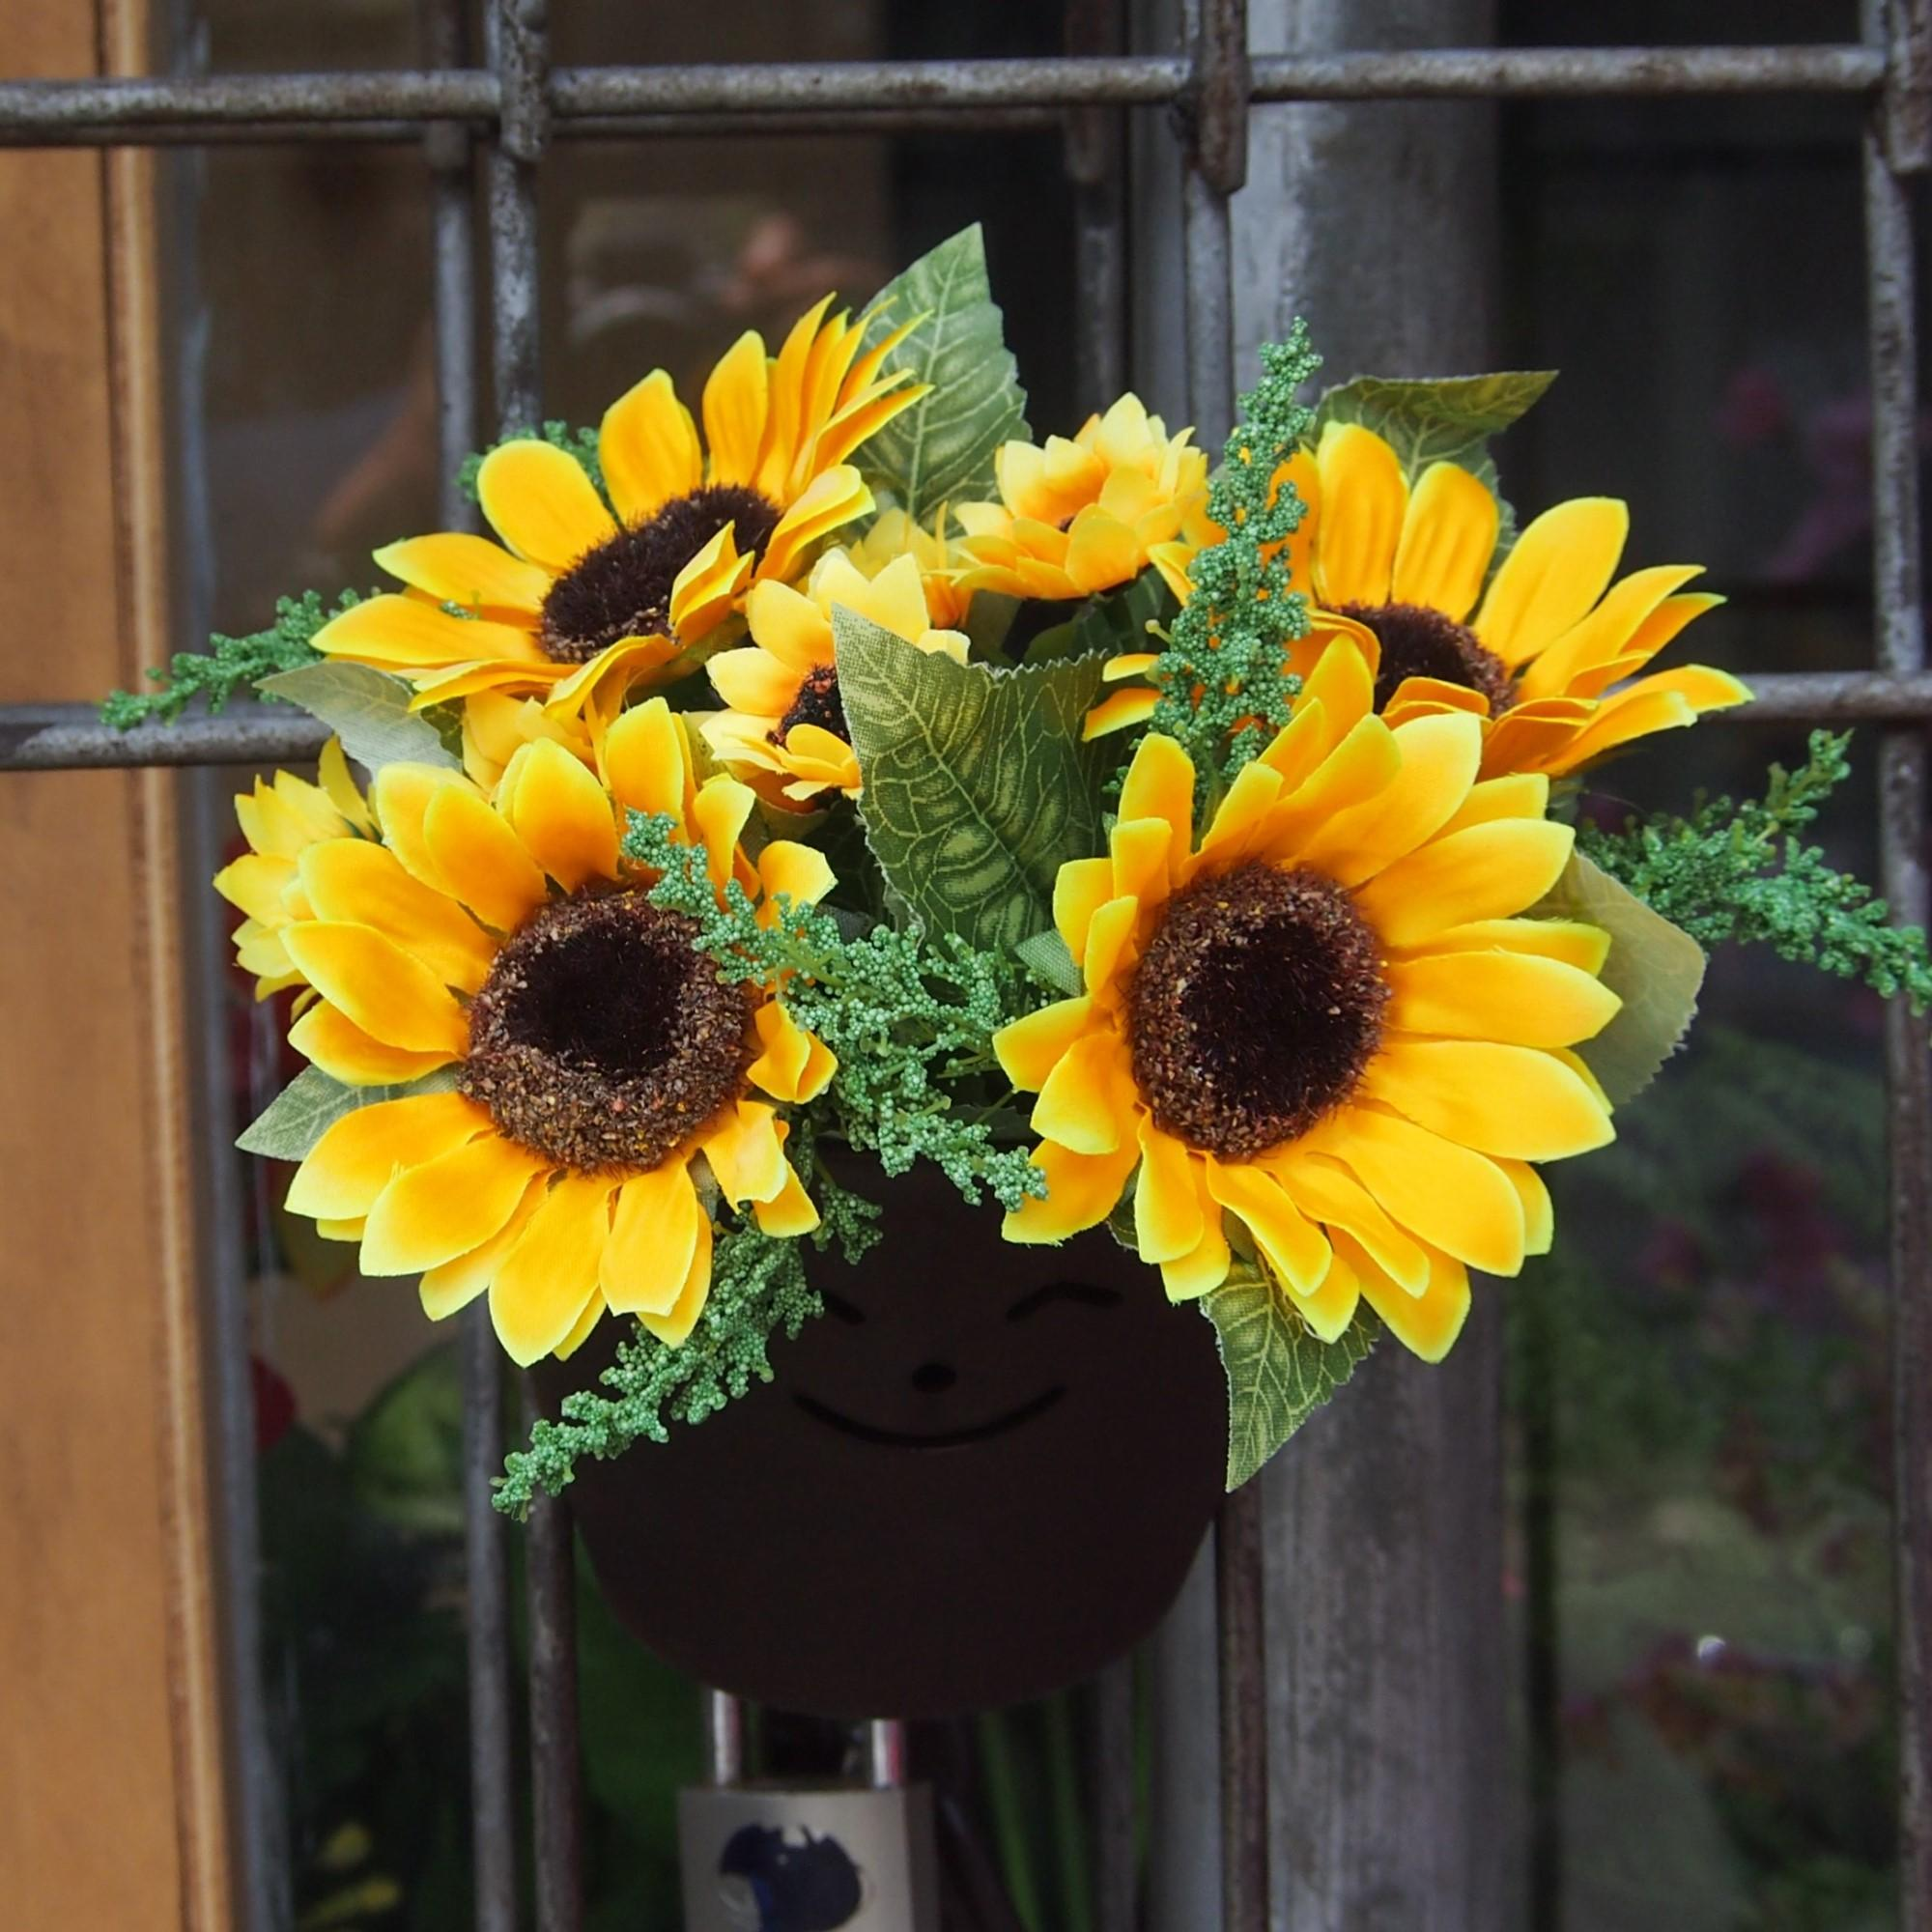 Bunga Pajangan Pot Tempel - Bunga Dekorasi Dan Pajangan - Bunga Matahari - 2 0c7278981f